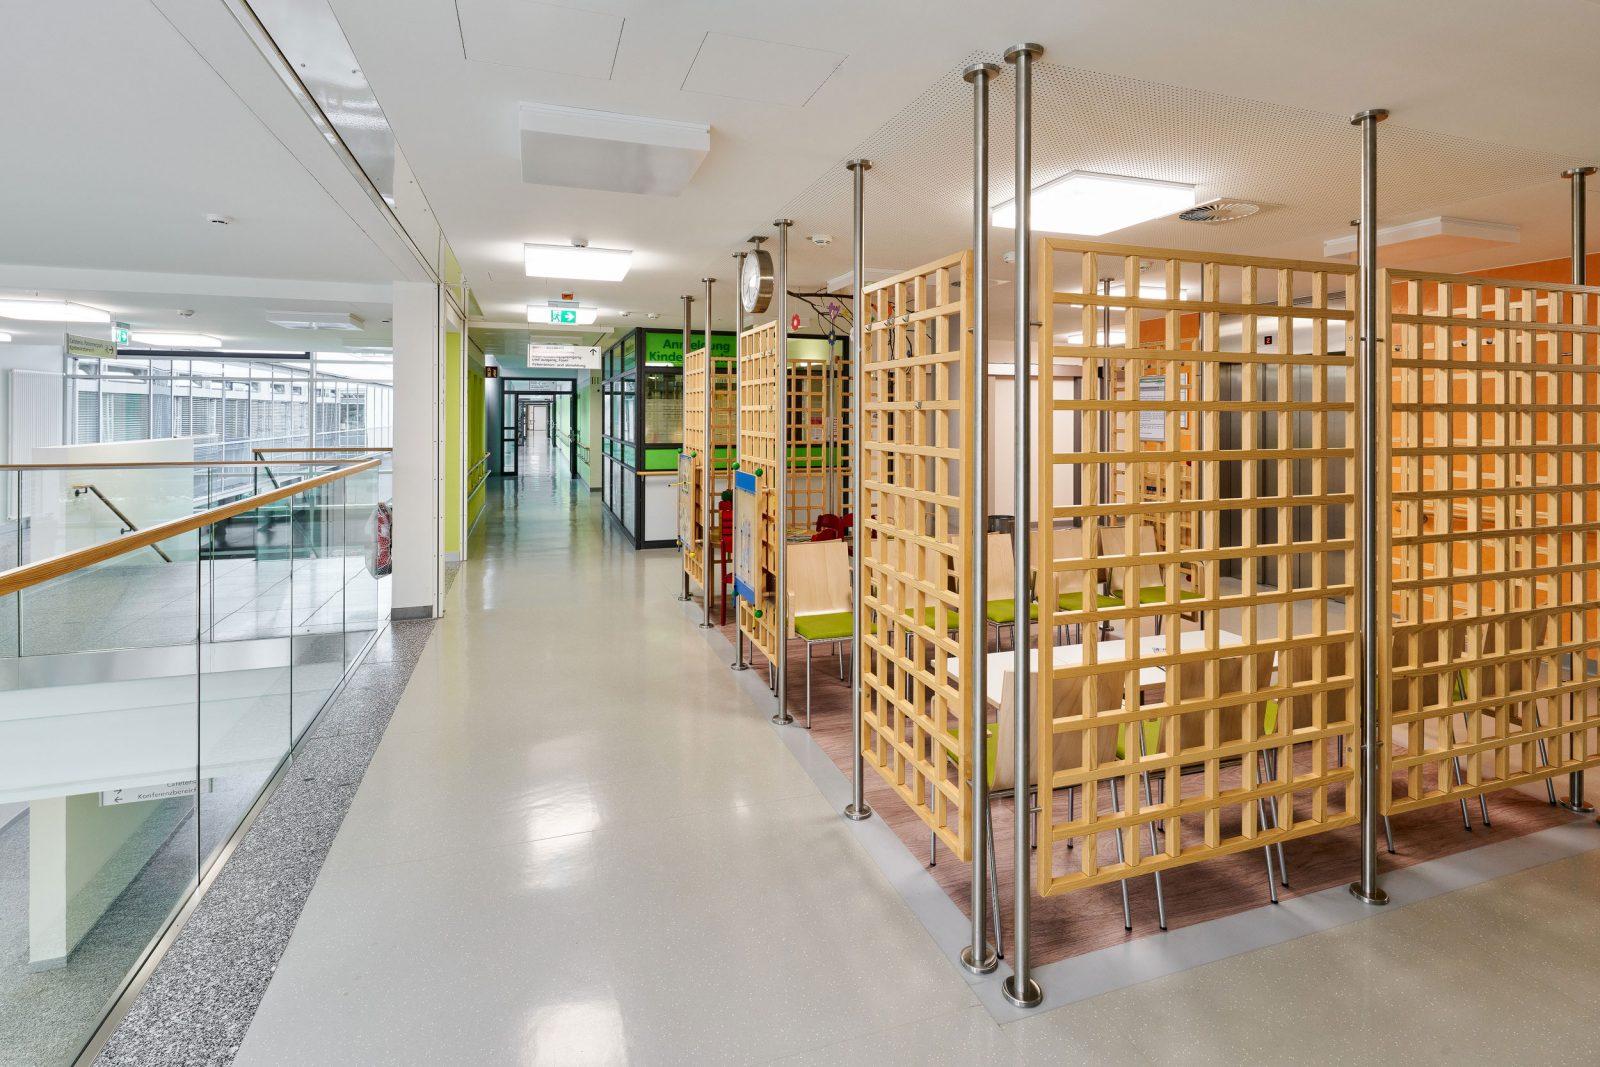 Oberlausitz-Kliniken Bautzen